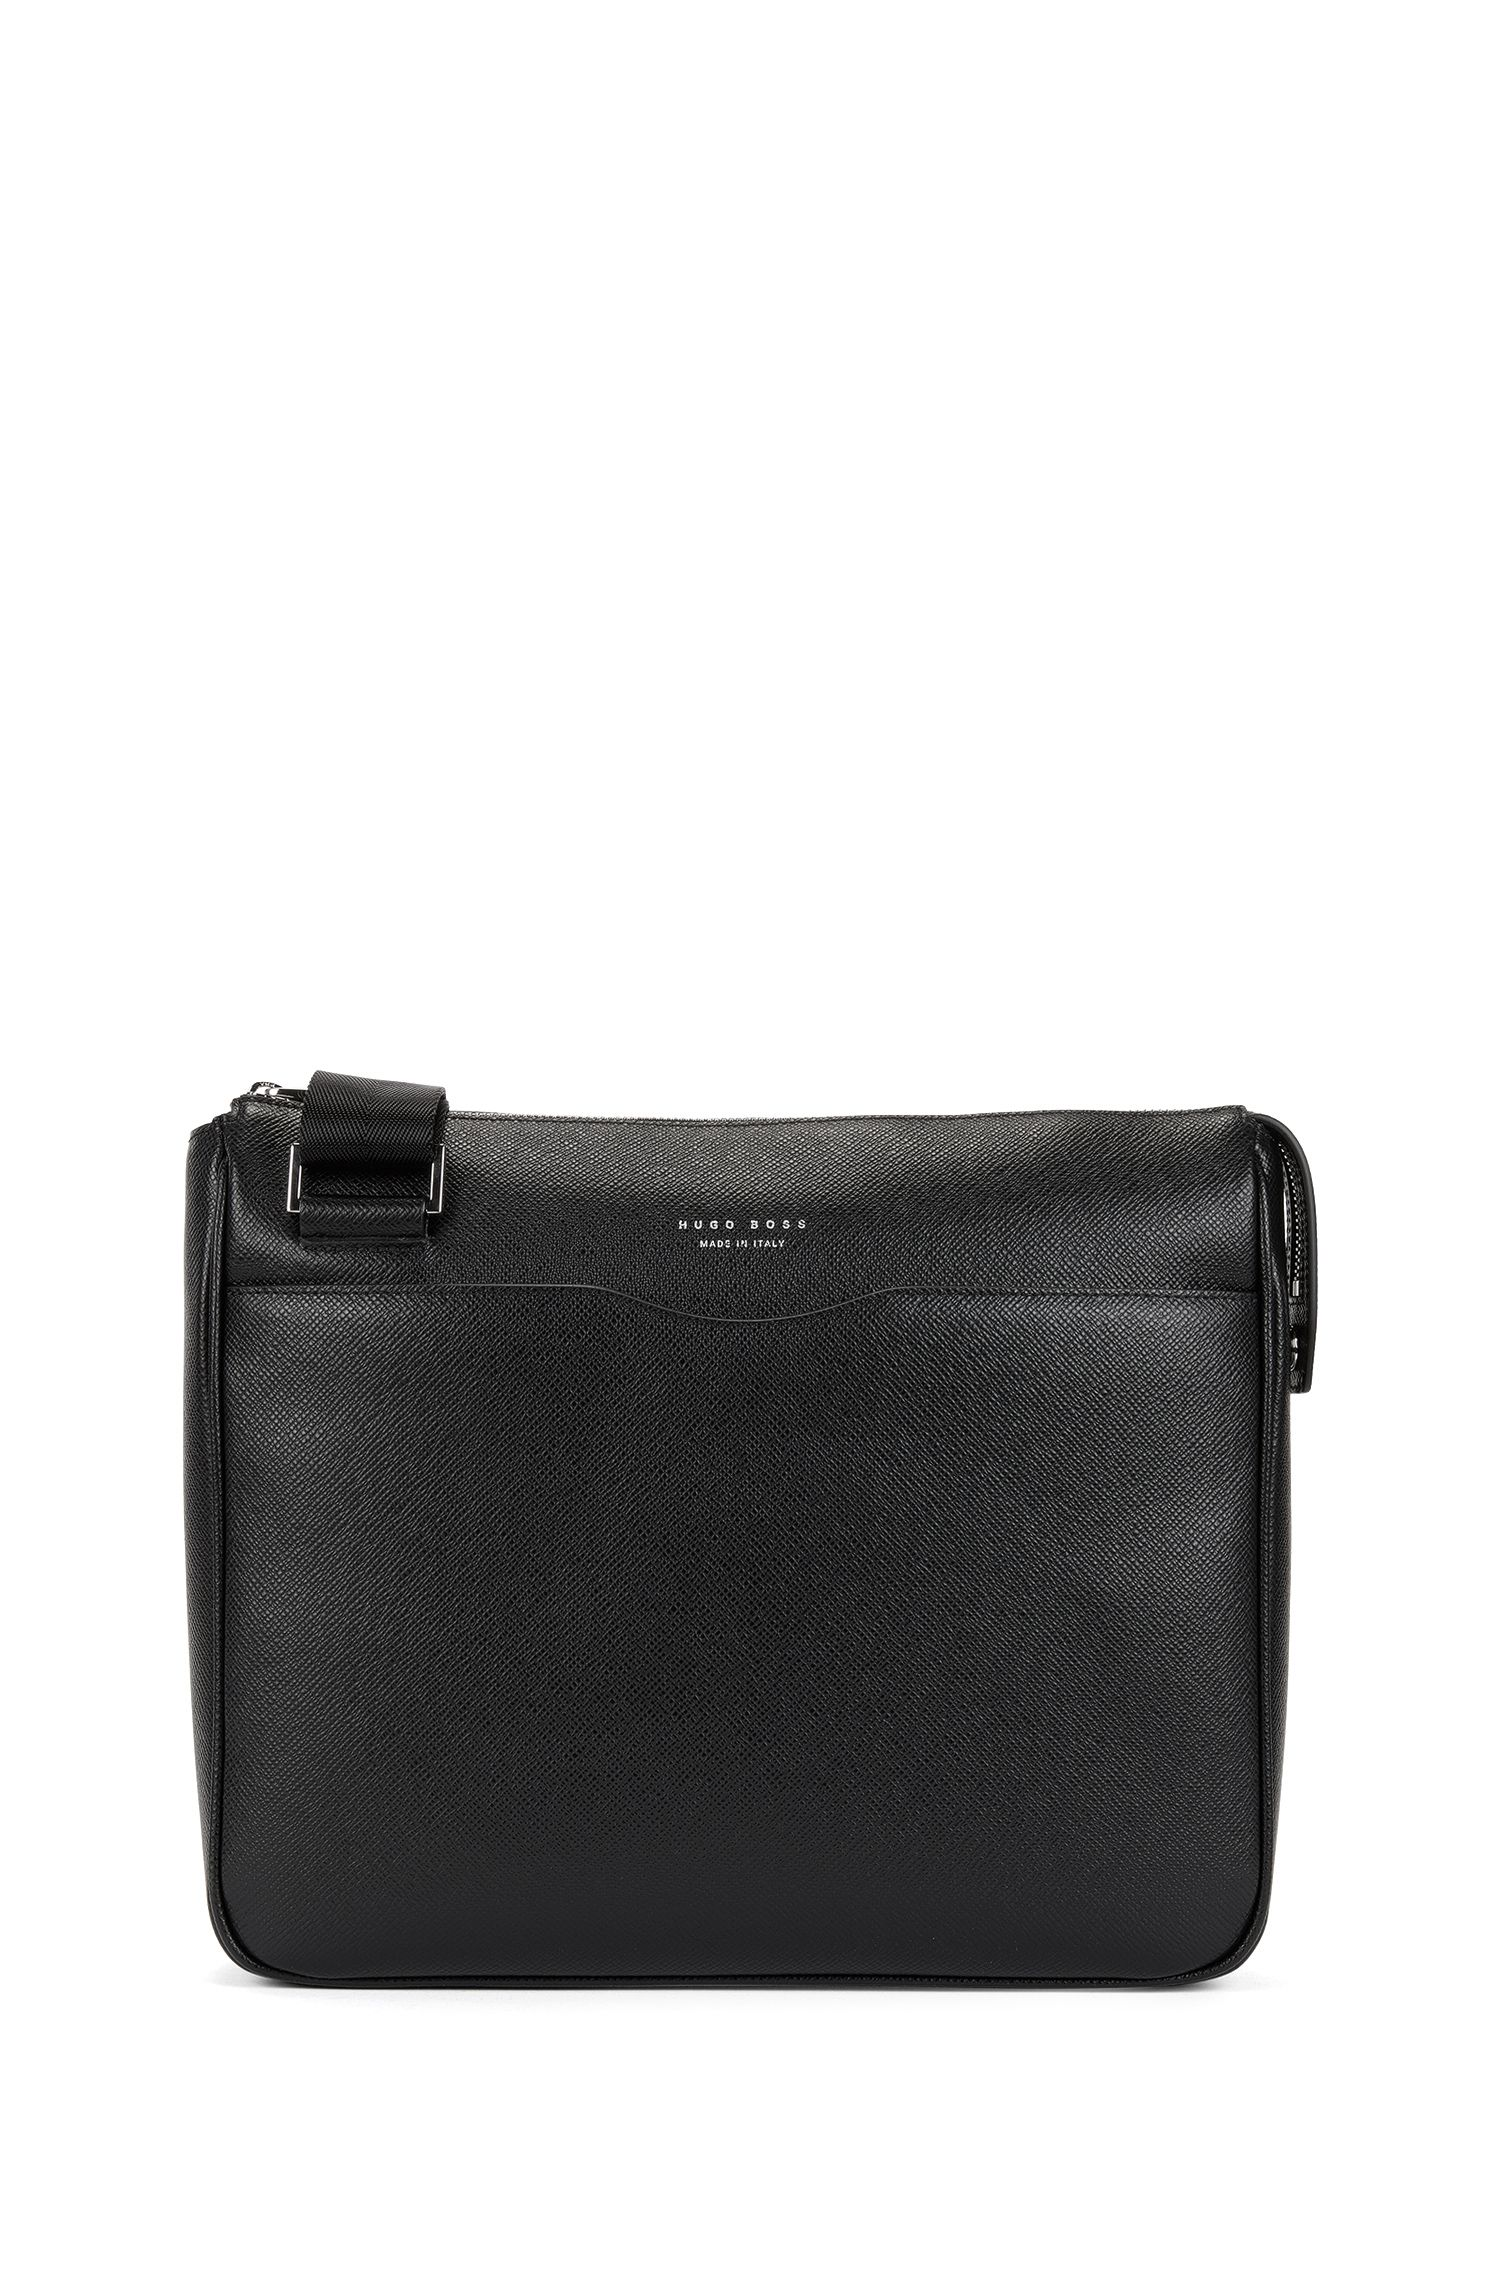 Leather Crossbody | Signature Cross Body, Black